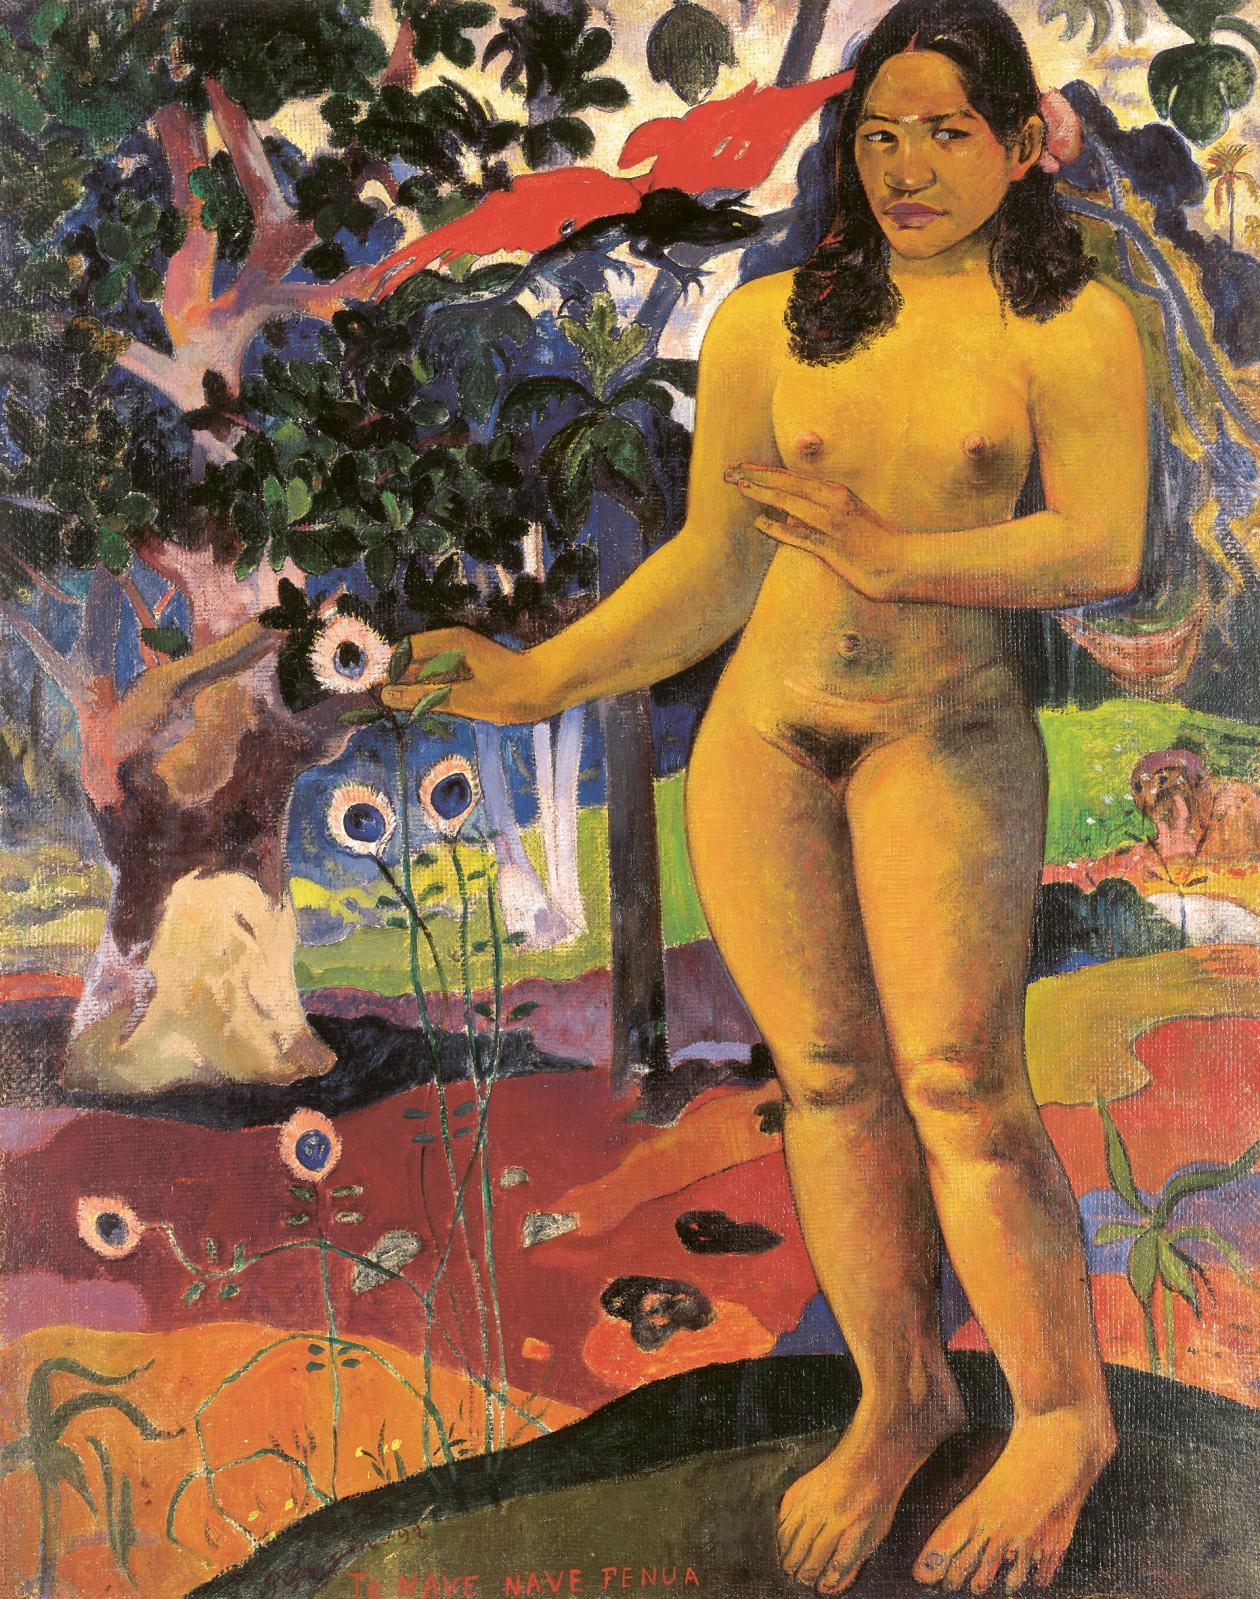 "Paul Gauguin (1848-1903),""Te nave nave fenua"" (The Delightful Land), 1892, oil on canvas, 91.3 x 72.1 cm. Kurashiki, Ohara Museum of Art."